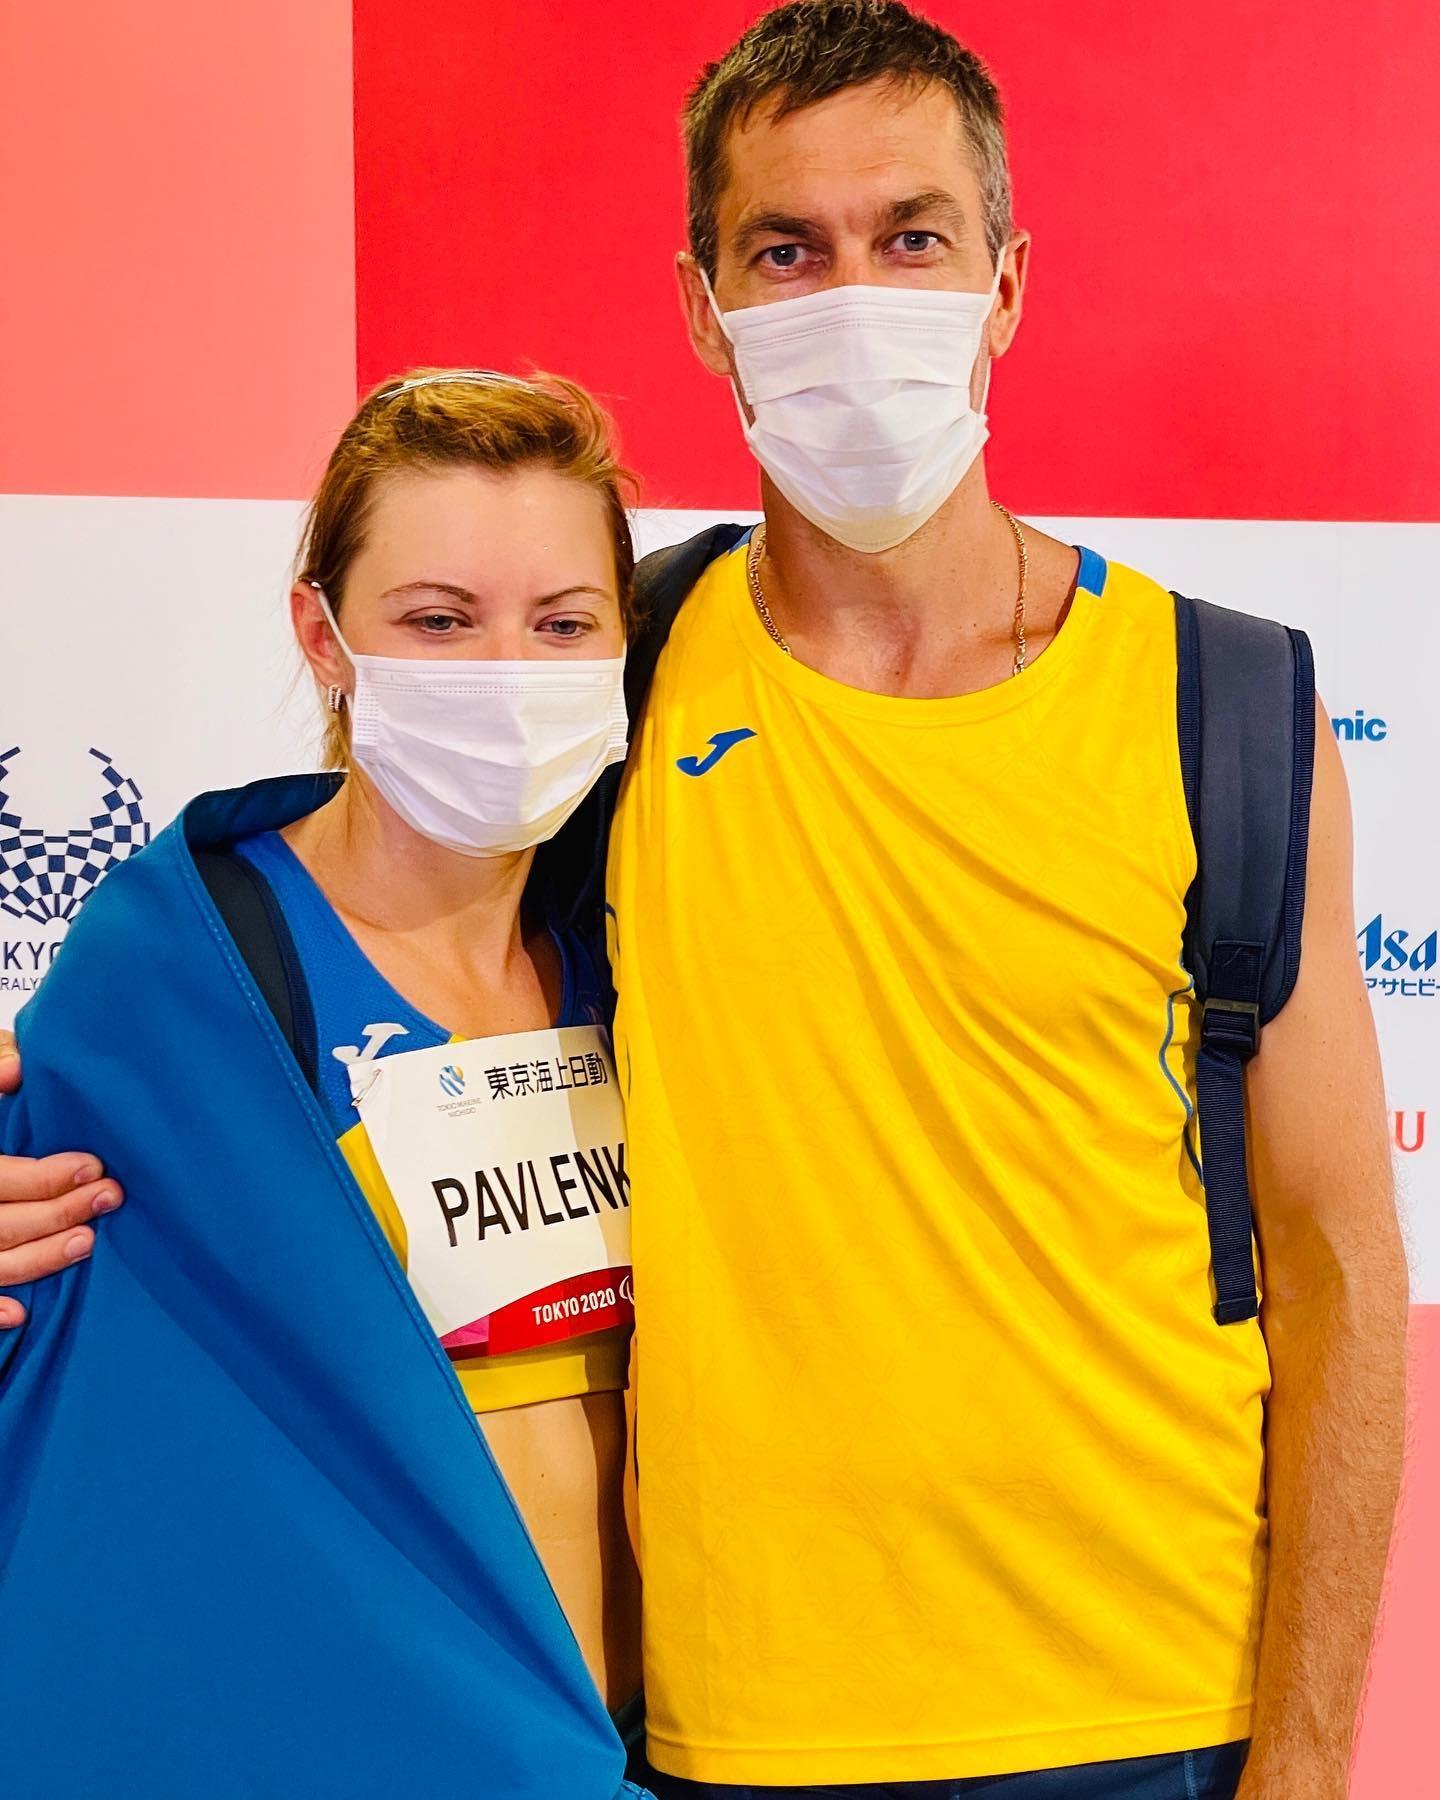 Серебро и бронза: украинские легкоатлеты получили еще две медали на Паралимпиаде в Токио - фото №2